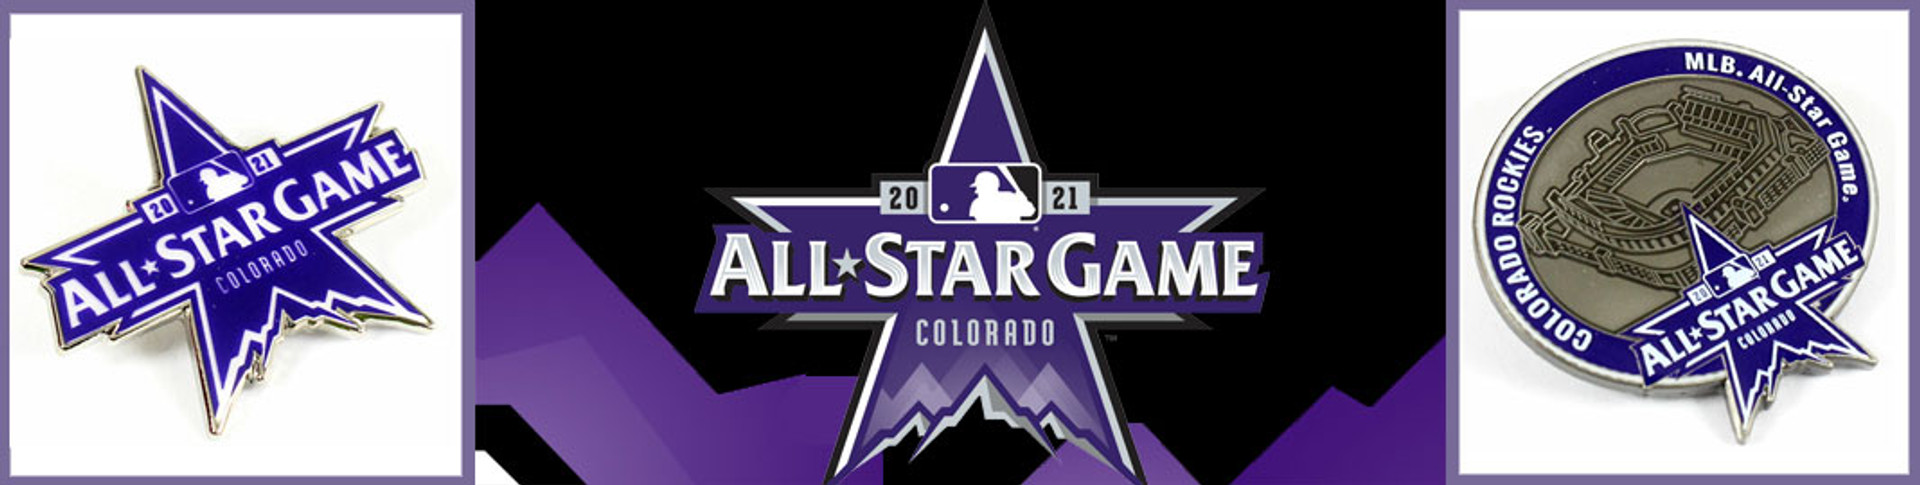 2021 mlb all star game pins